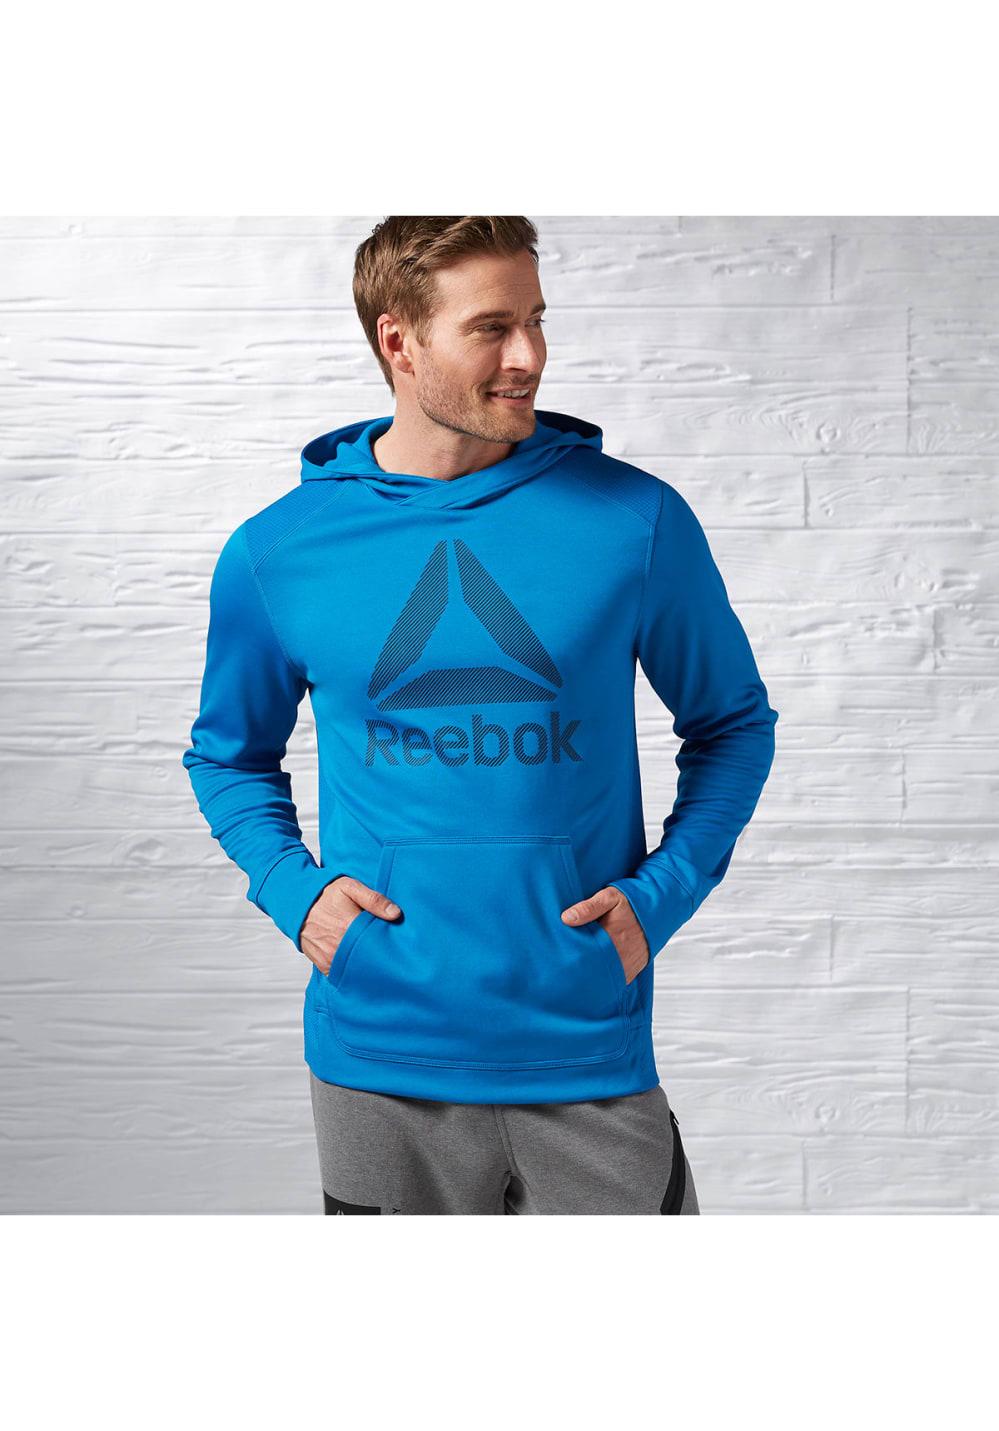 Reebok Workout Ready Warm Poly Fleece Sweats Pulls pour Homme Bleu